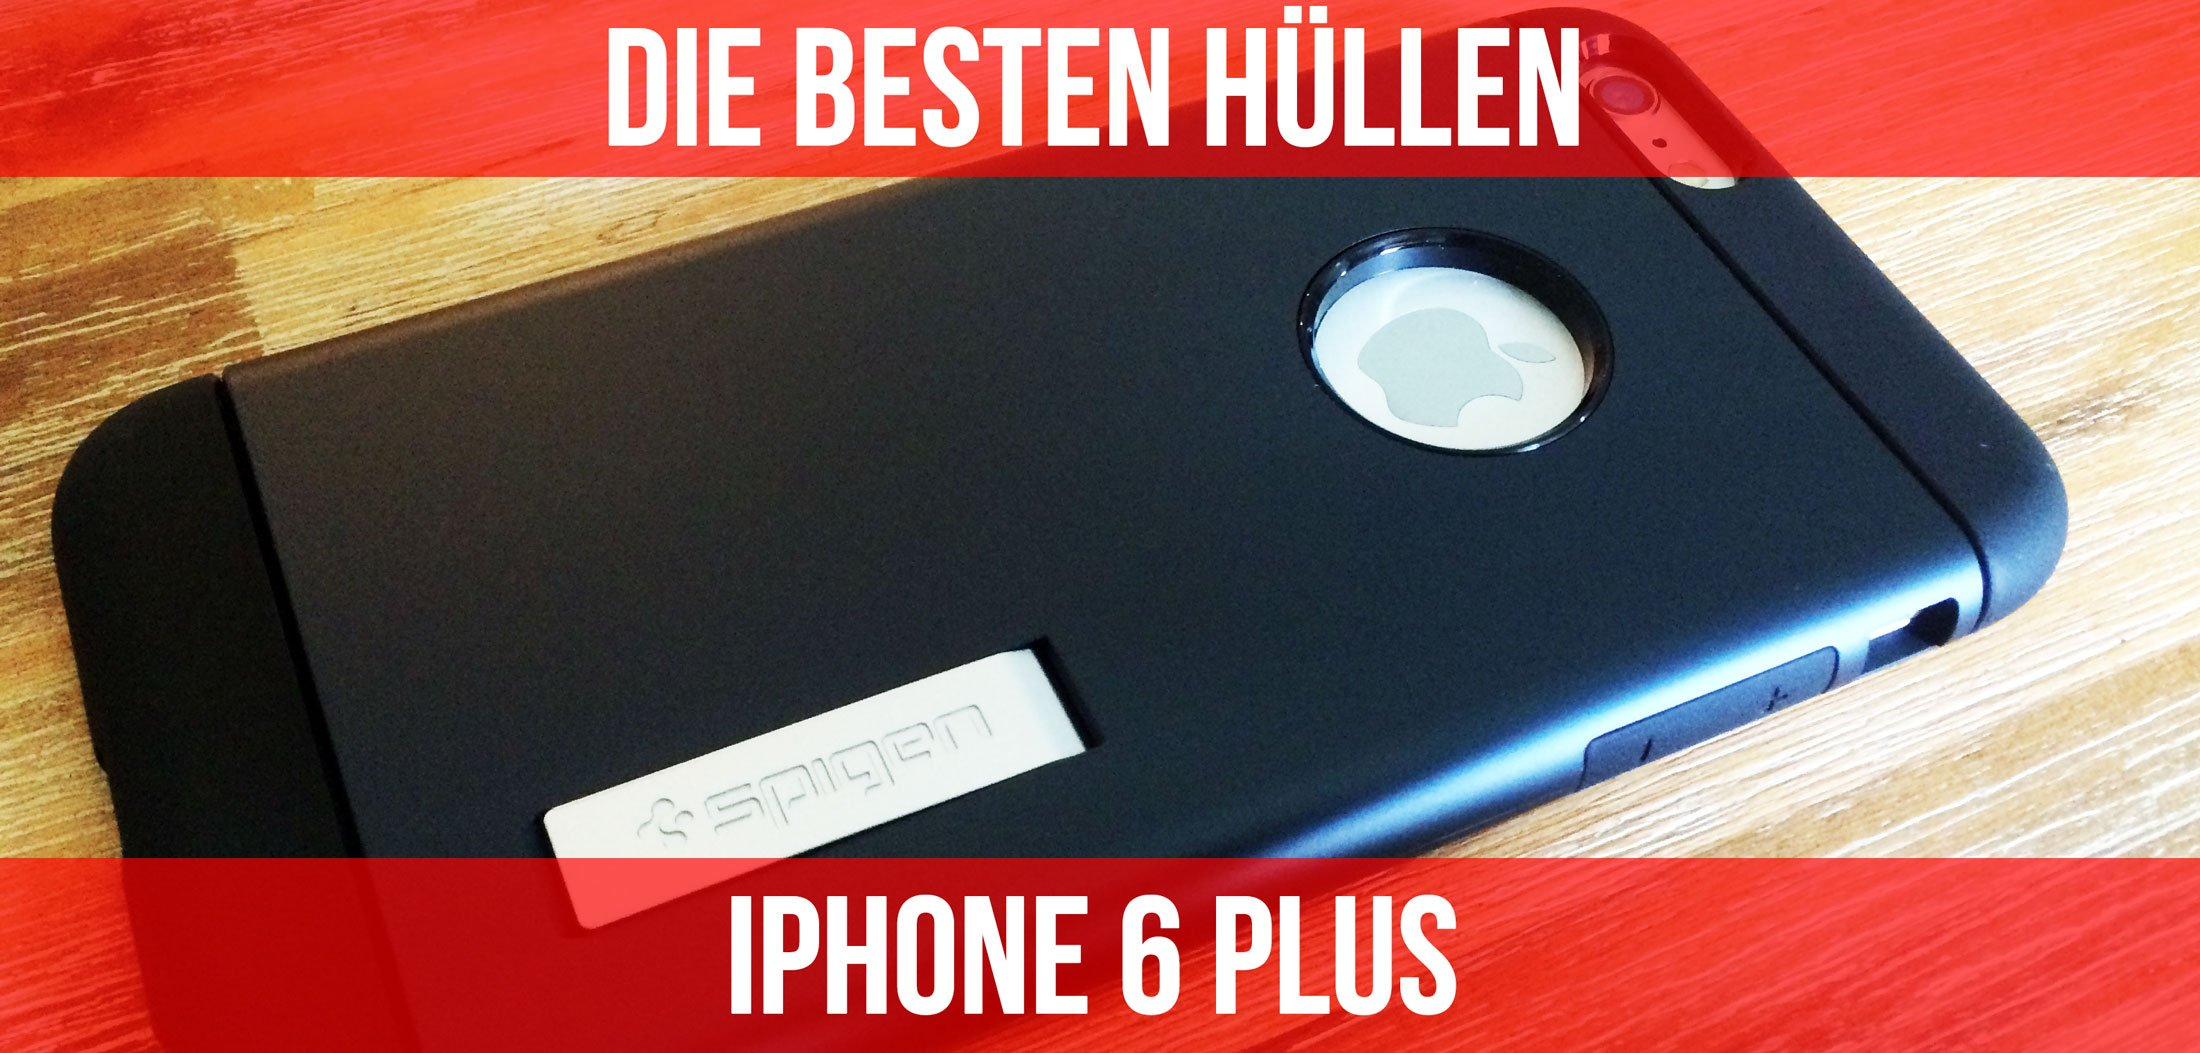 iPhone 6 Plus Hüllen Test: die besten iPhone 6 Plus Cases 11